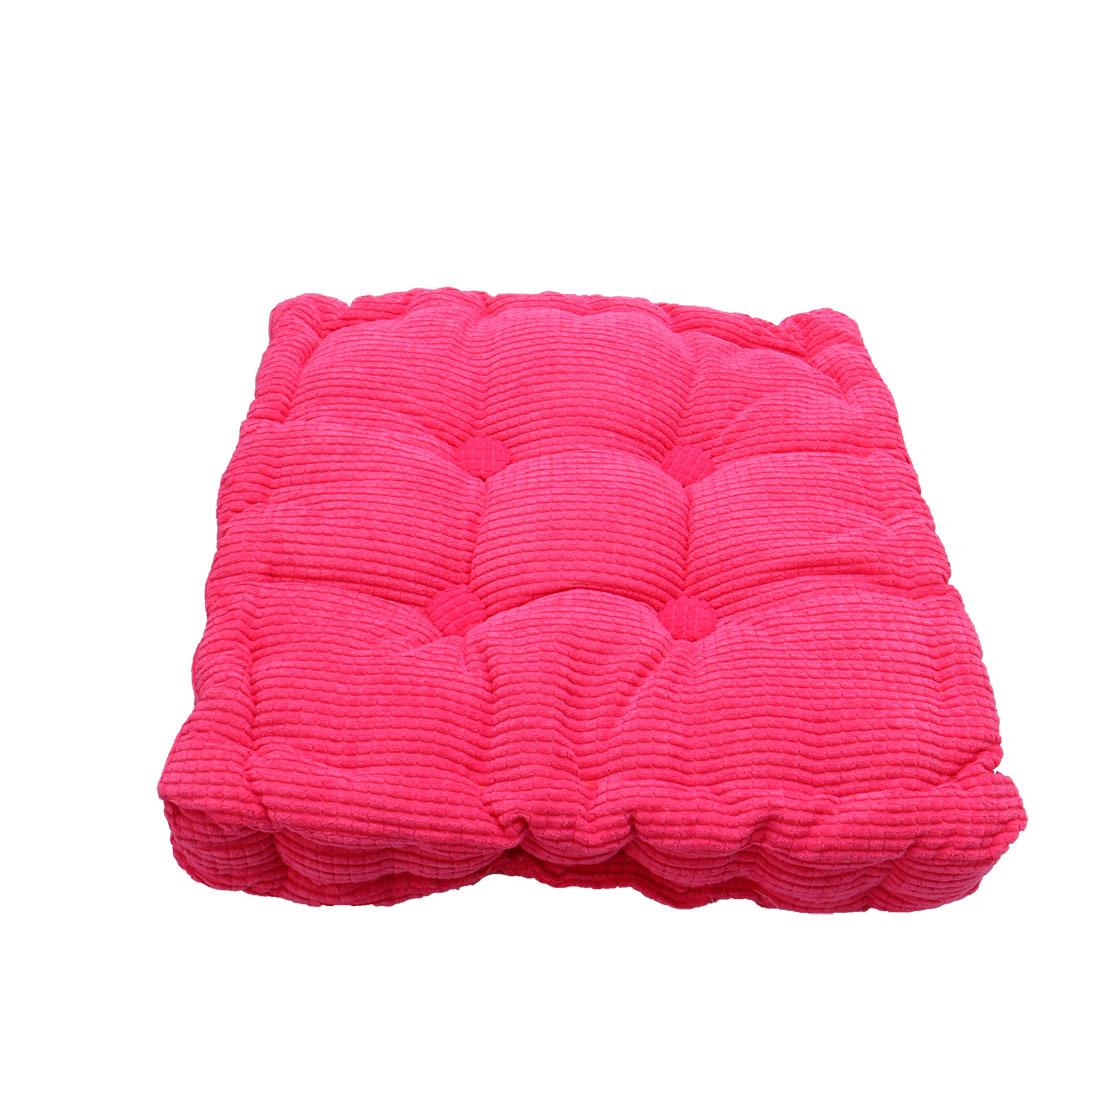 Home Office Corduroy Square Shaped Anti Slip Seat Chair Cushion Pad Cover Fuchsia